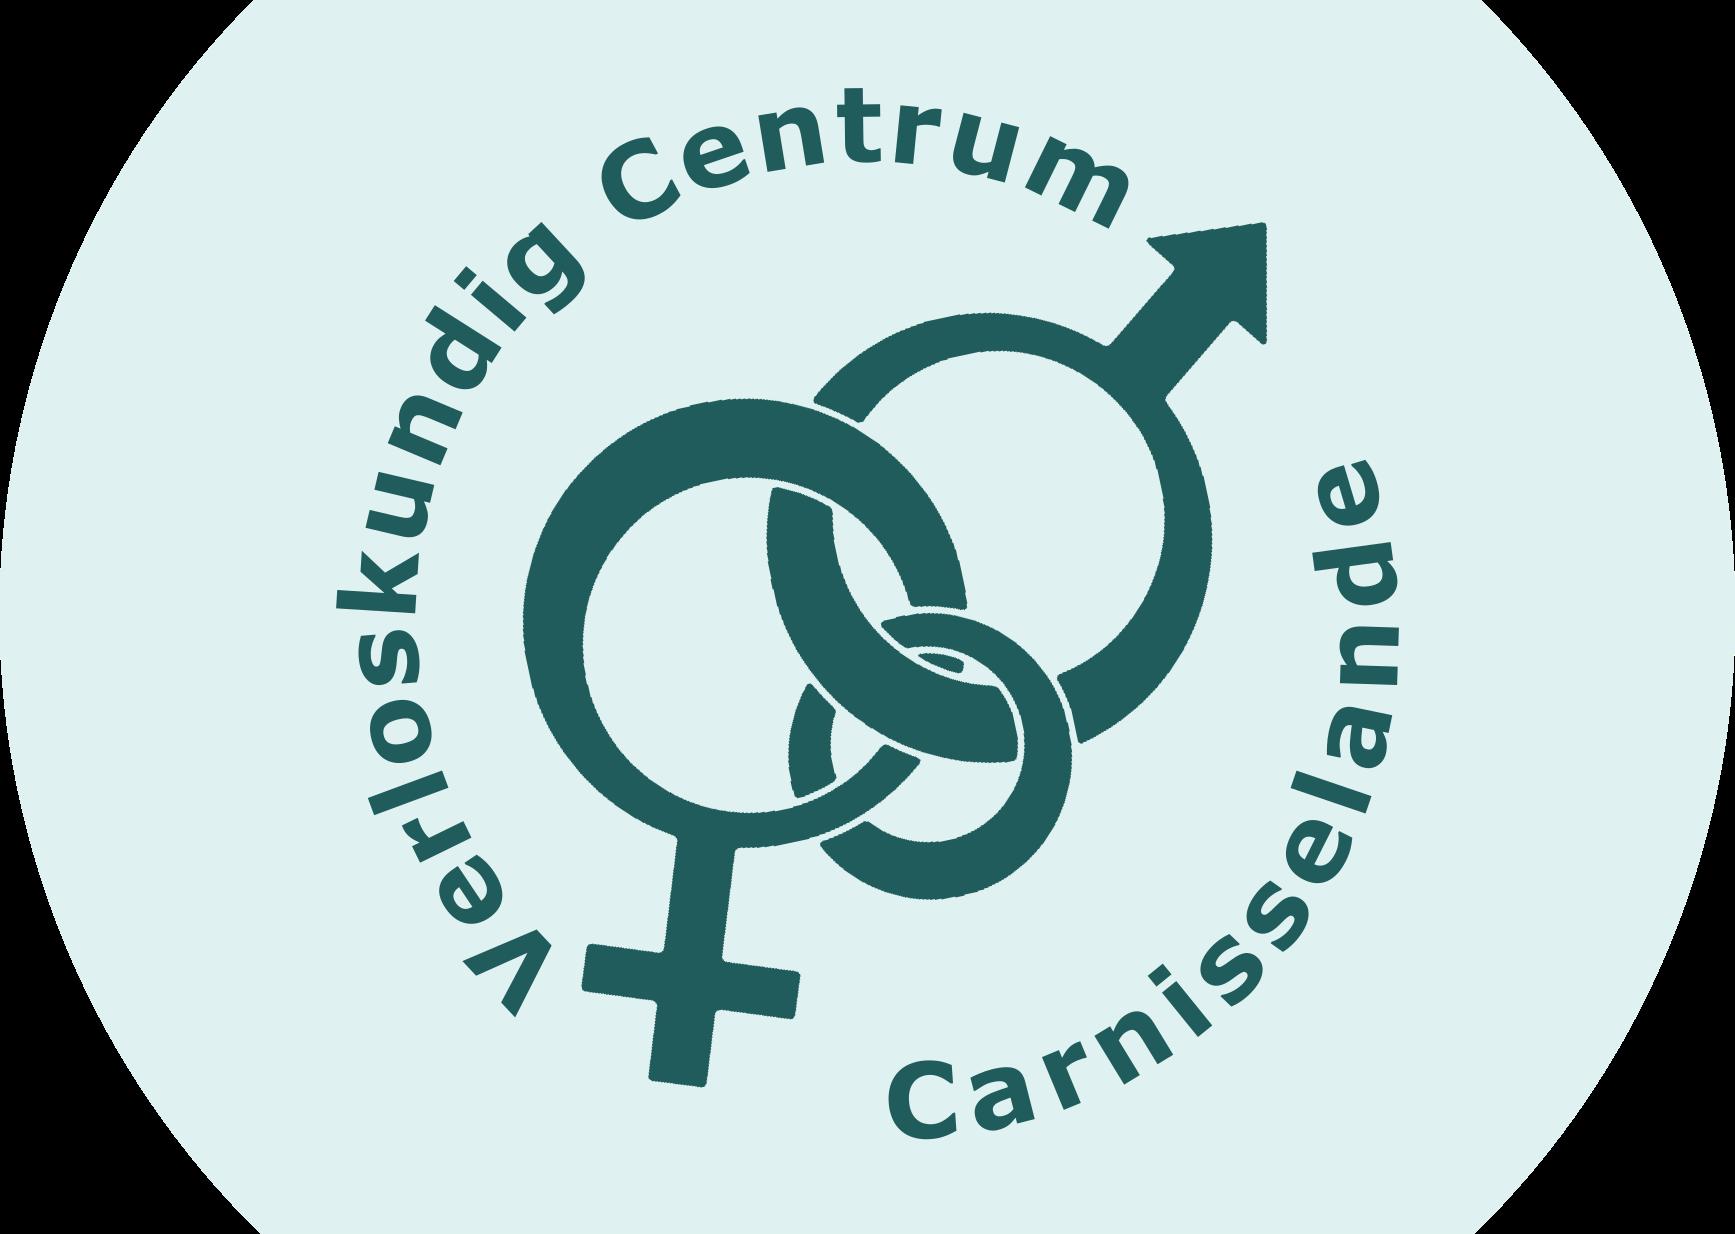 Verloskundig Centrum Carnisselande